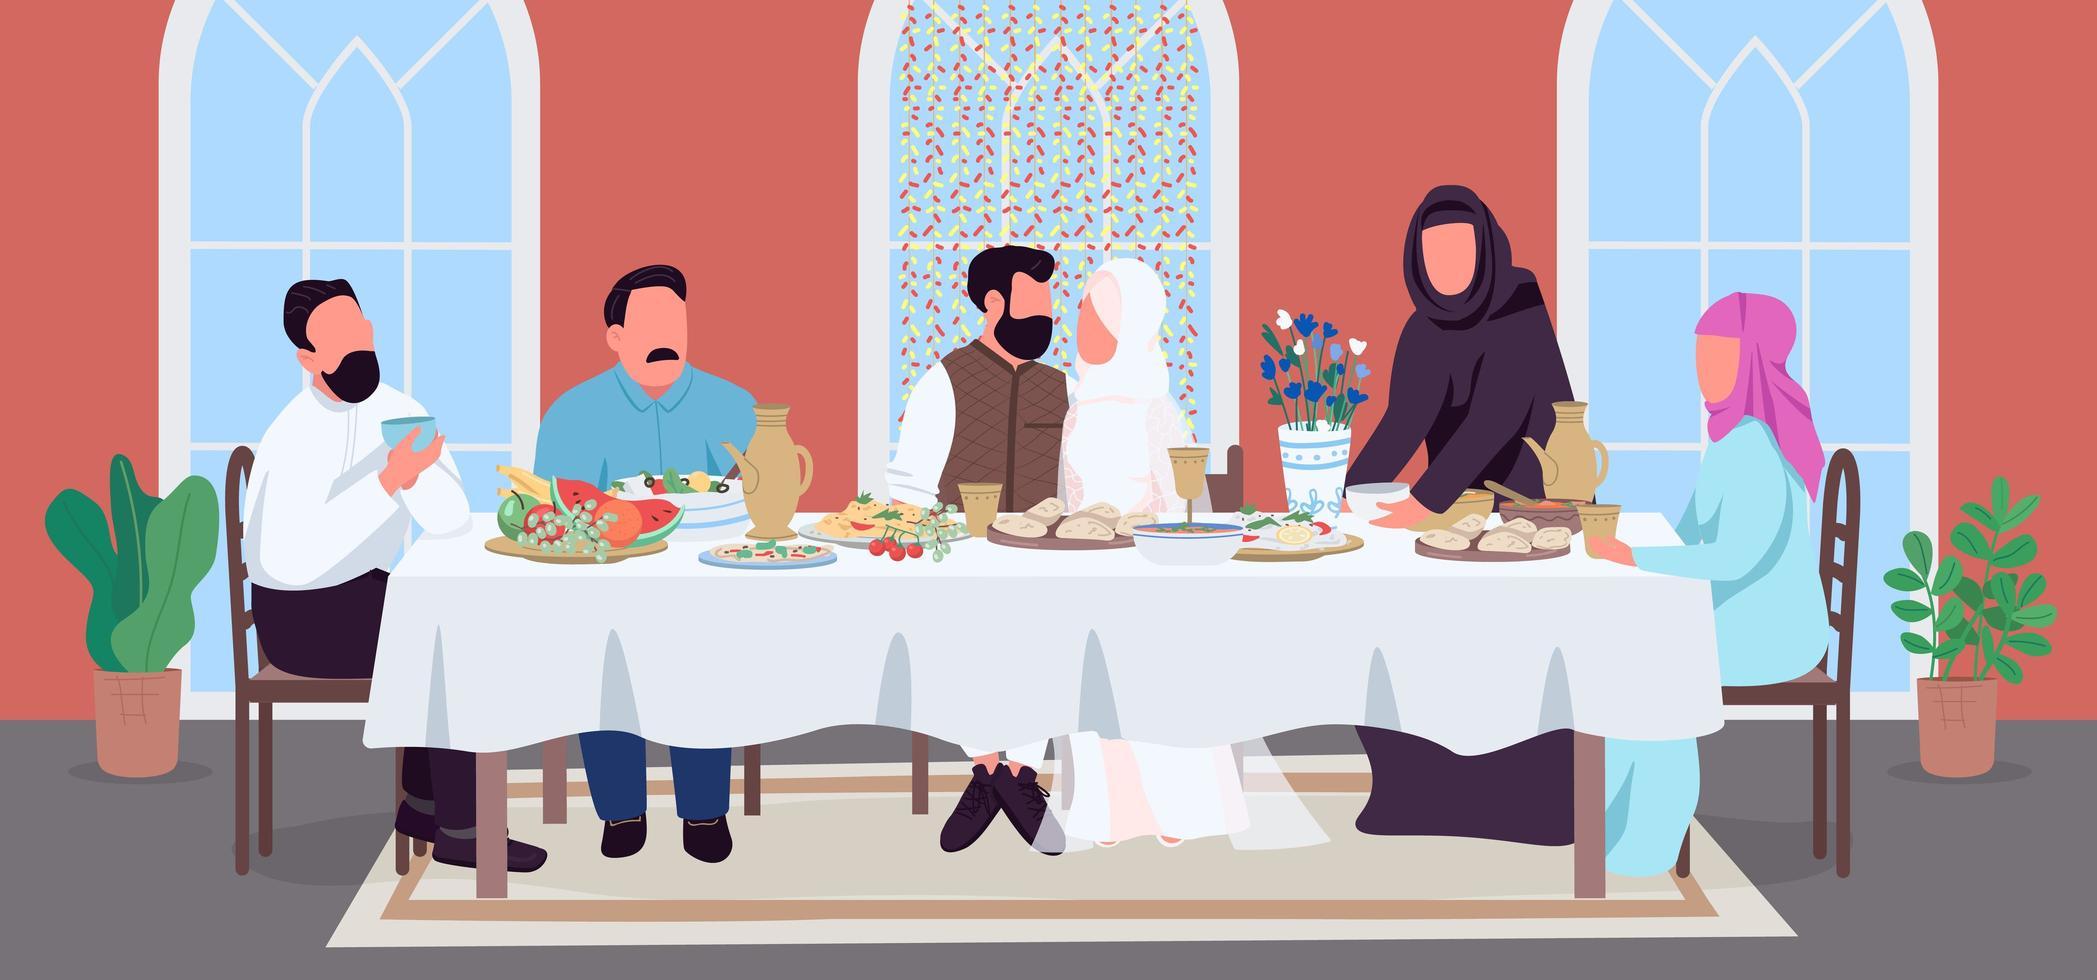 jantar de casamento muçulmano vetor